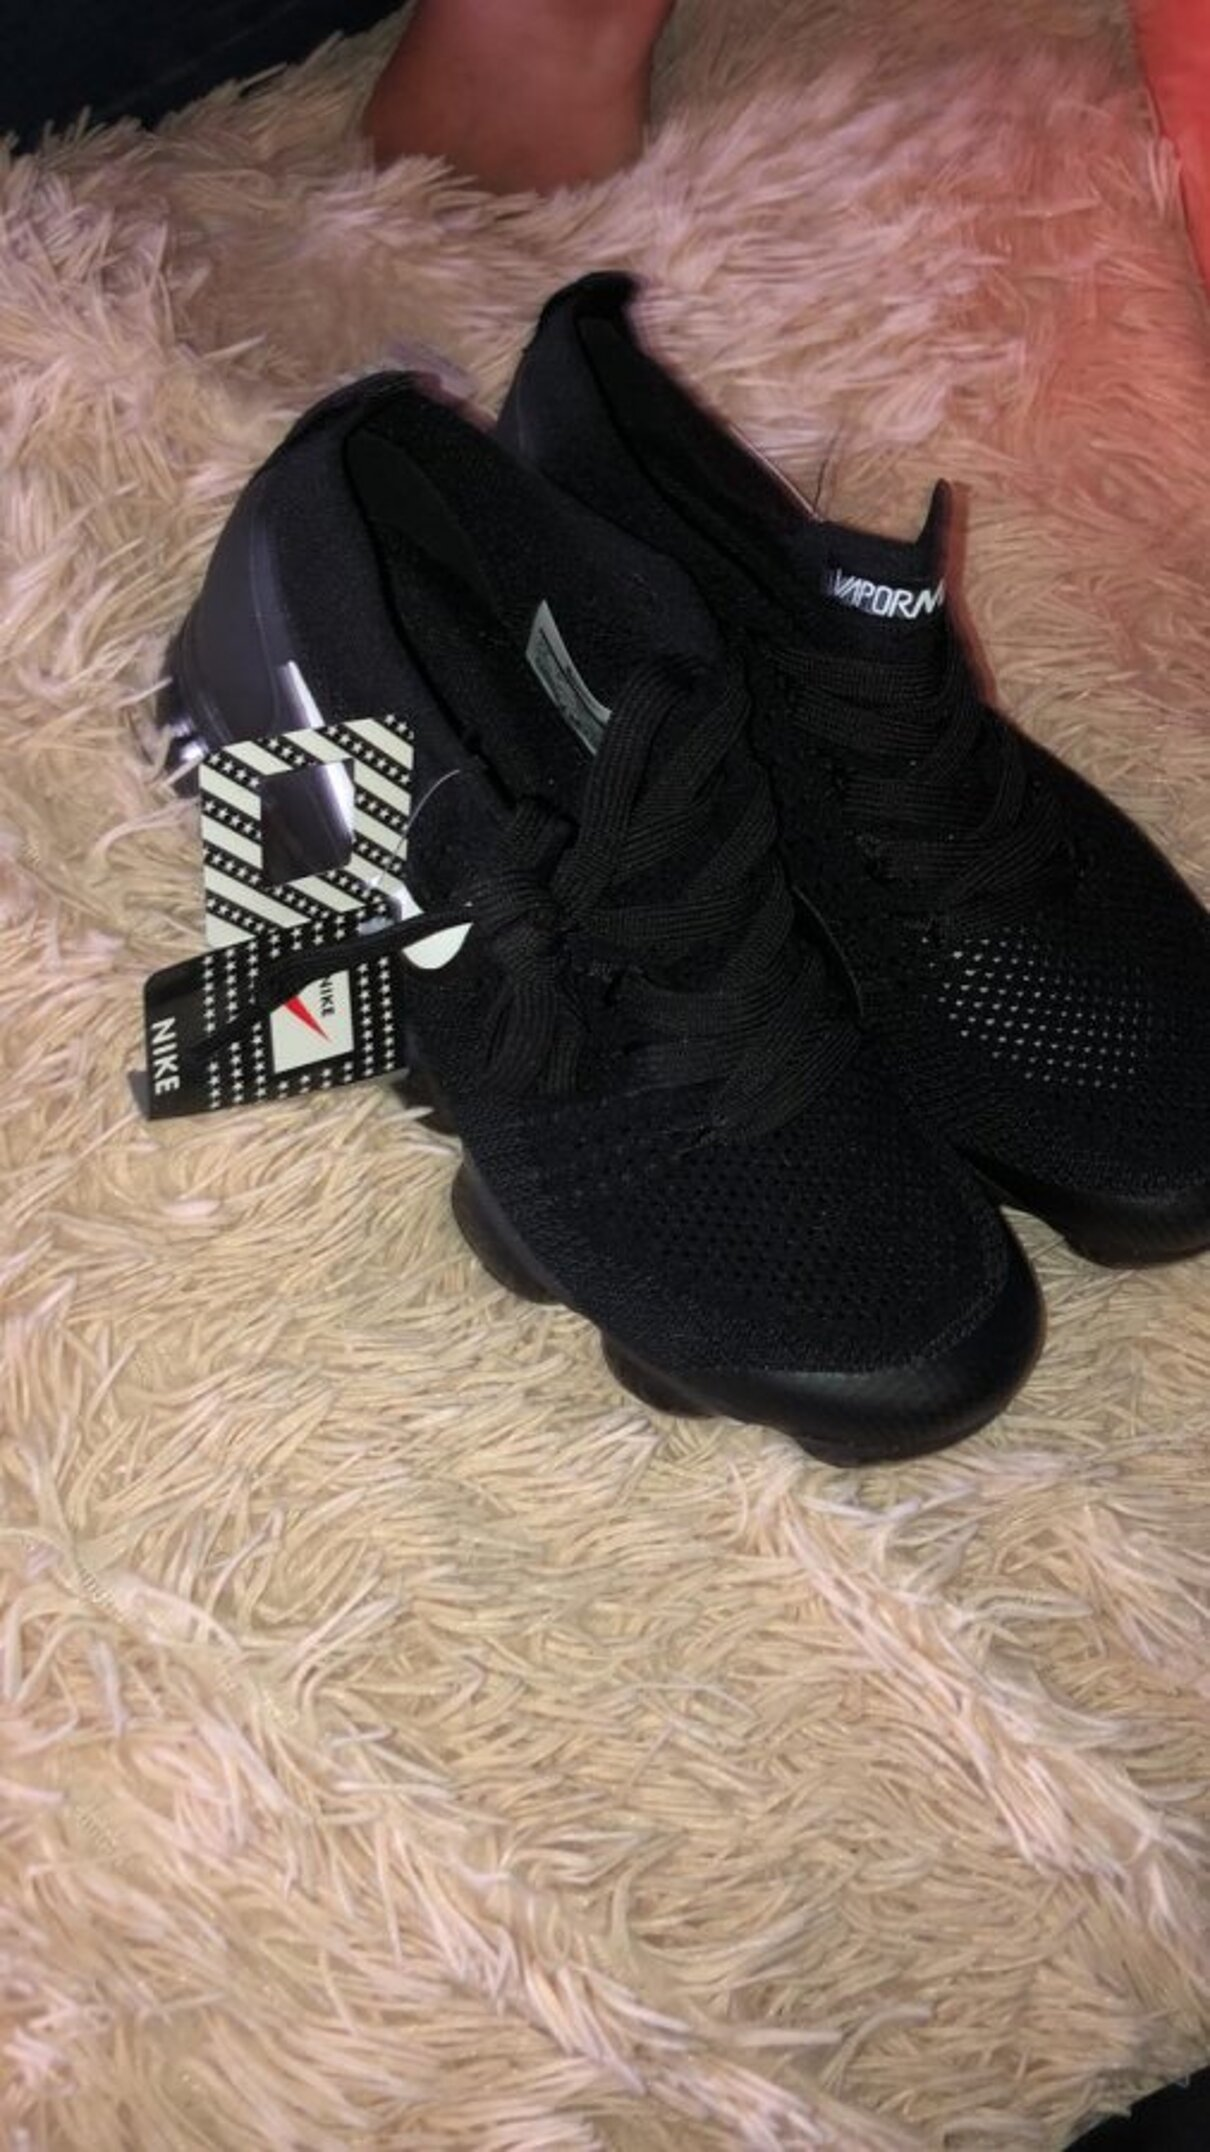 Жалоба-отзыв: Https://instagram.com/sneakersmarket.ru? igshid=14g9xn2y3d2eb - Не тот товар